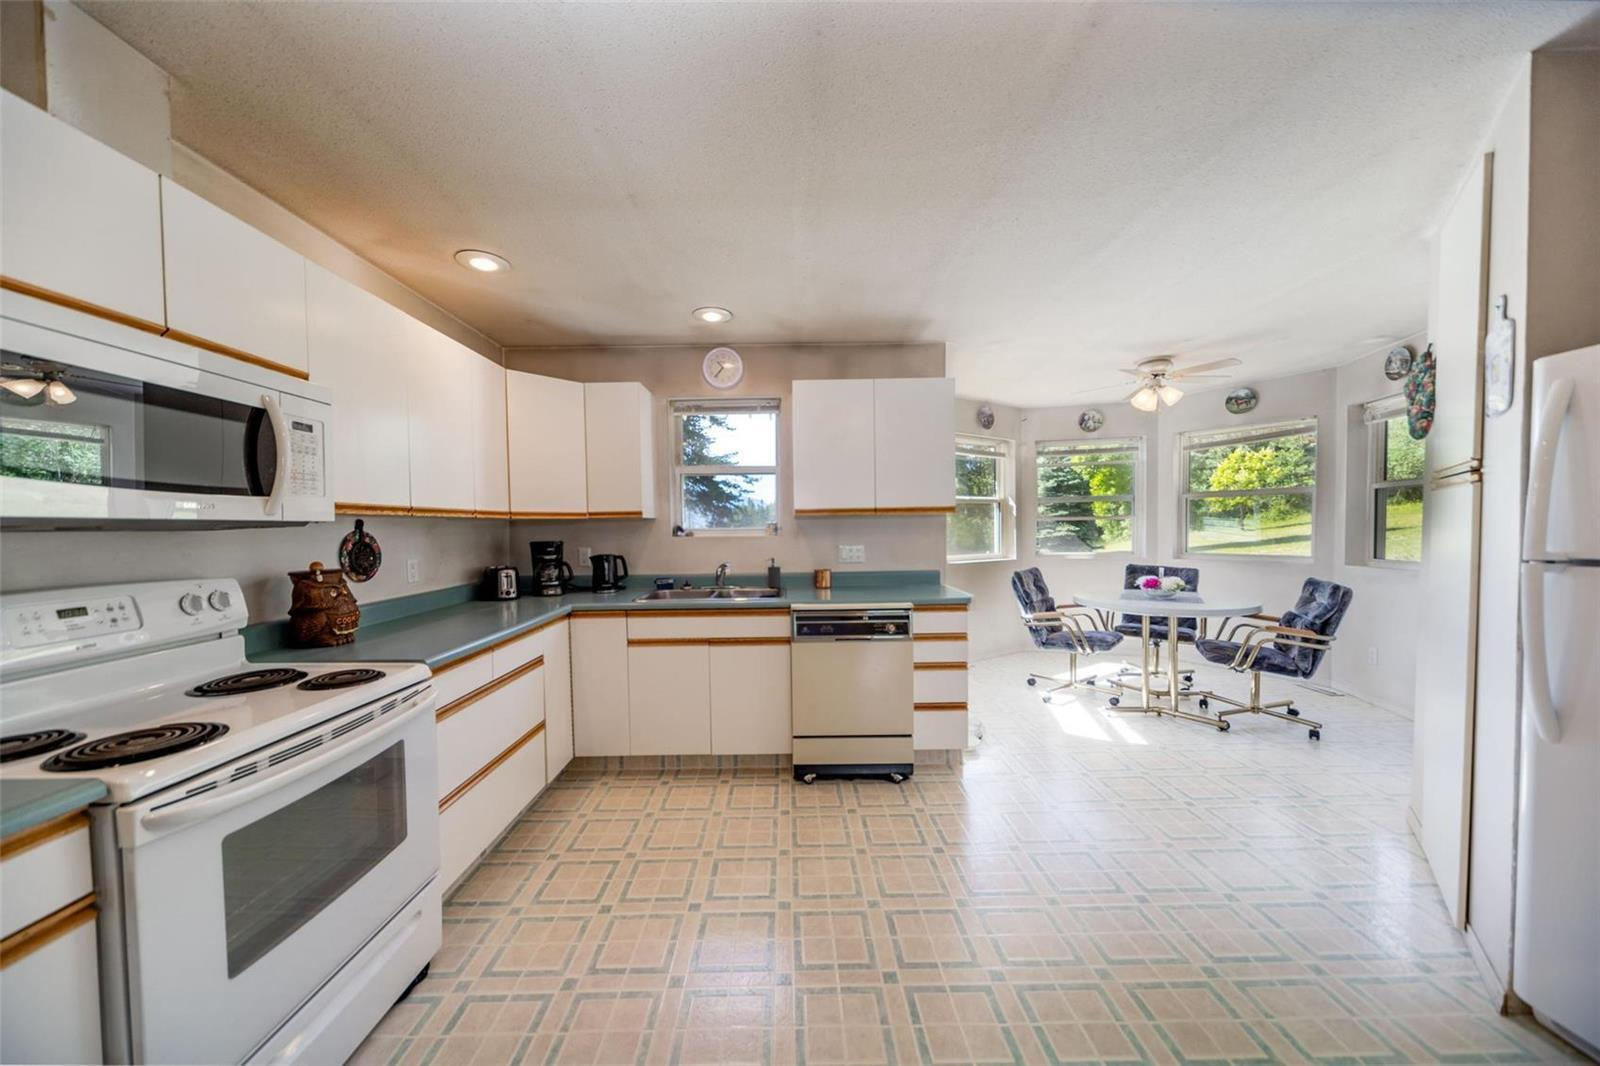 4602 Schubert Road,, Armstrong, British Columbia  V0E 1B4 - Photo 13 - 10232684